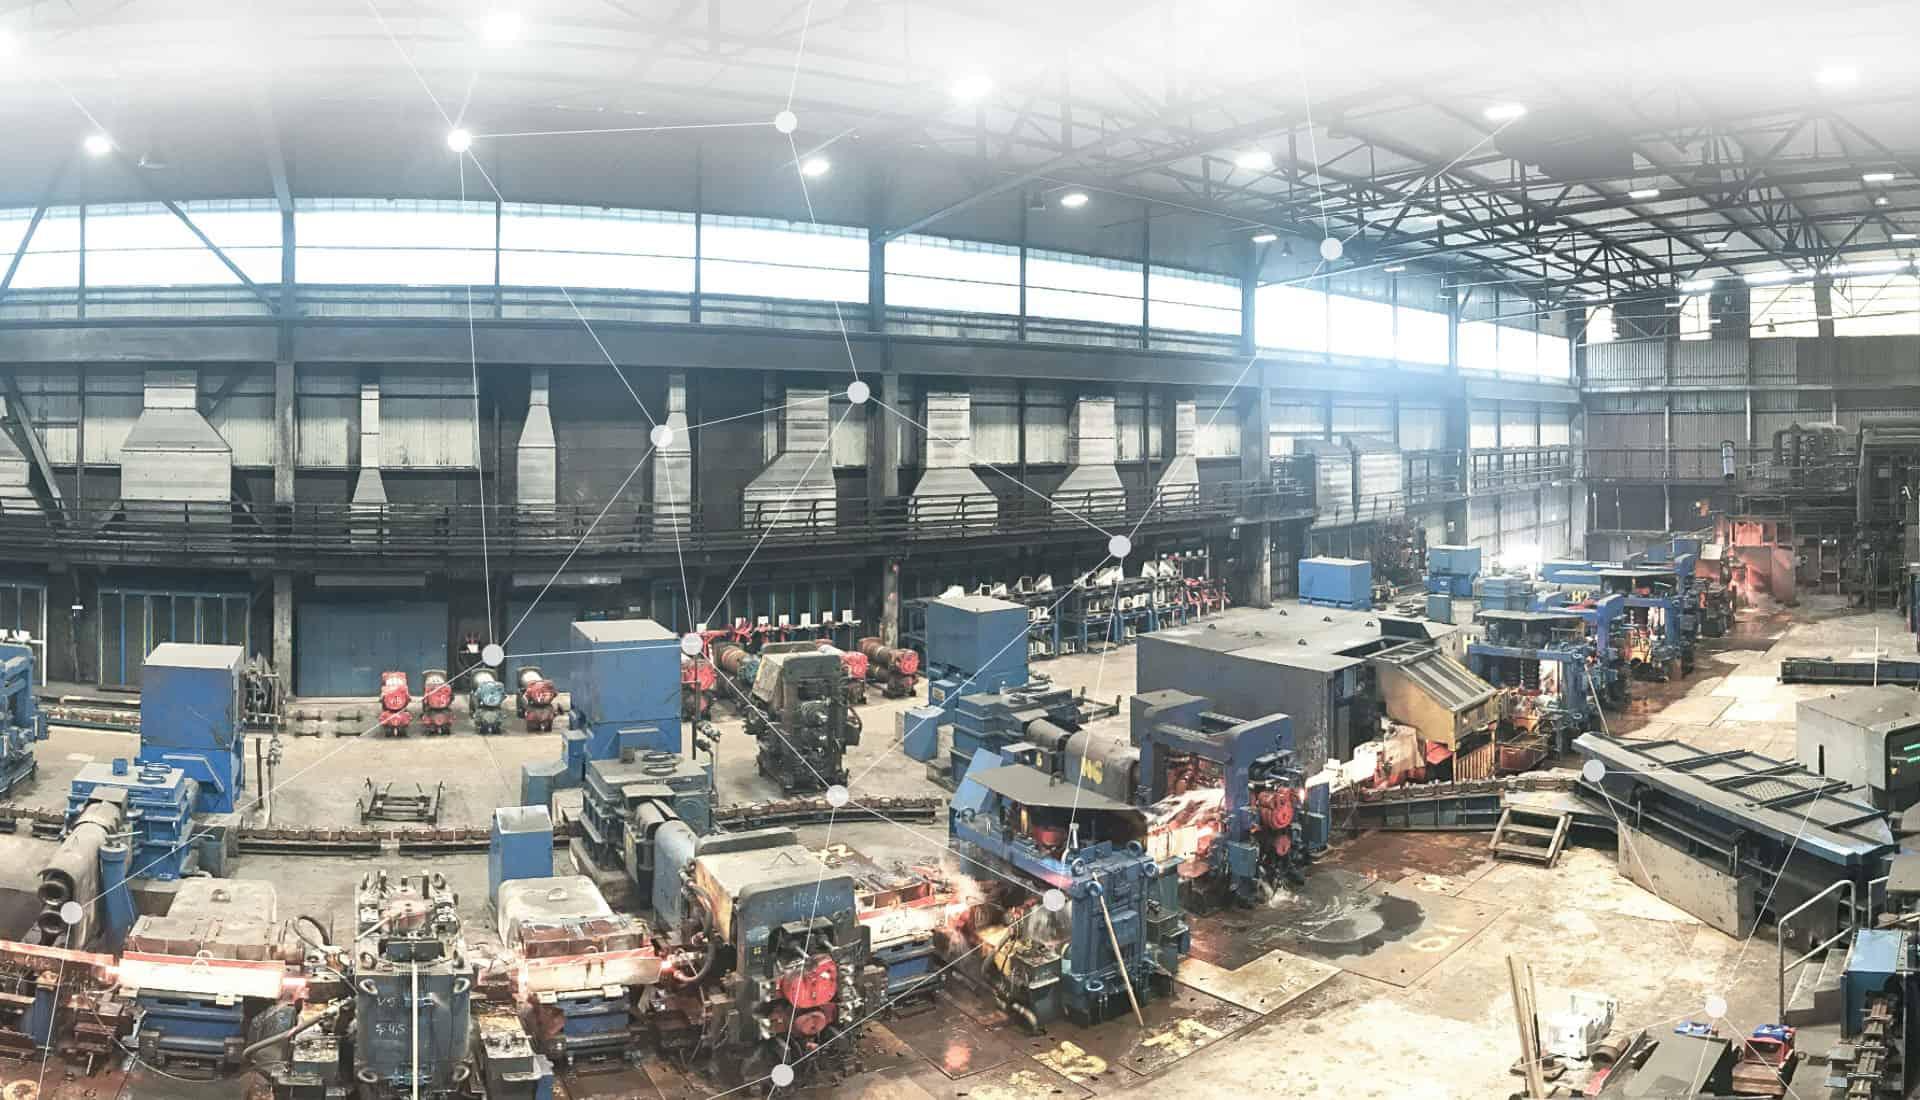 elektroplanung sanierung led beleuchtung gebauedeautomation energieeffizienz walzwerk swiss steel elmaplan ag